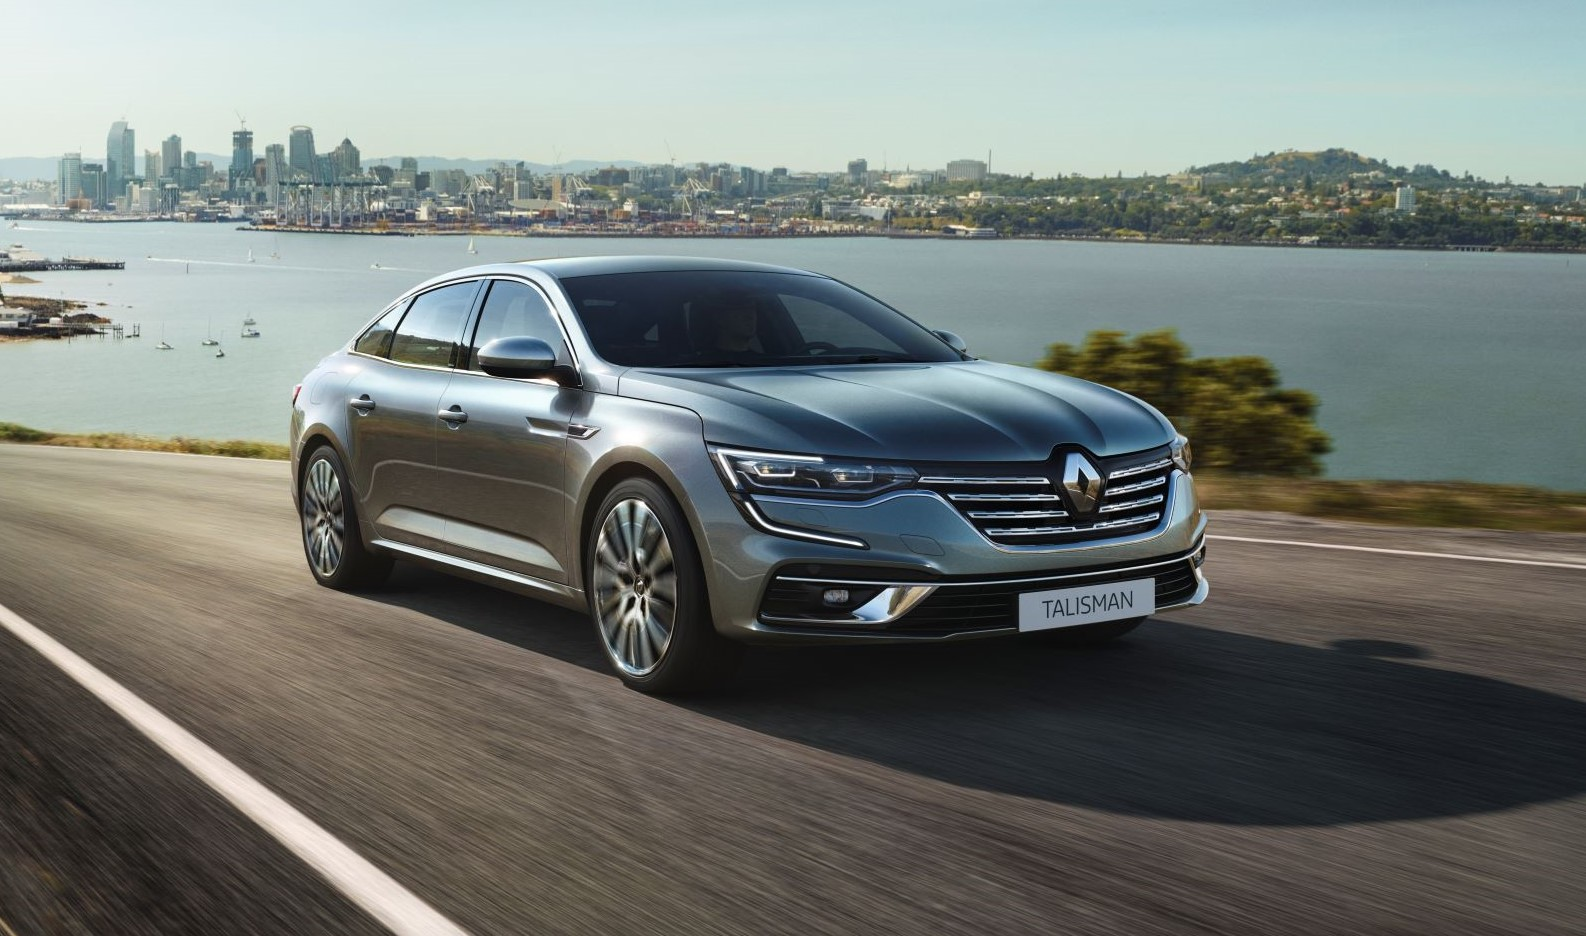 Renault-Talisman-facelift-2020-1